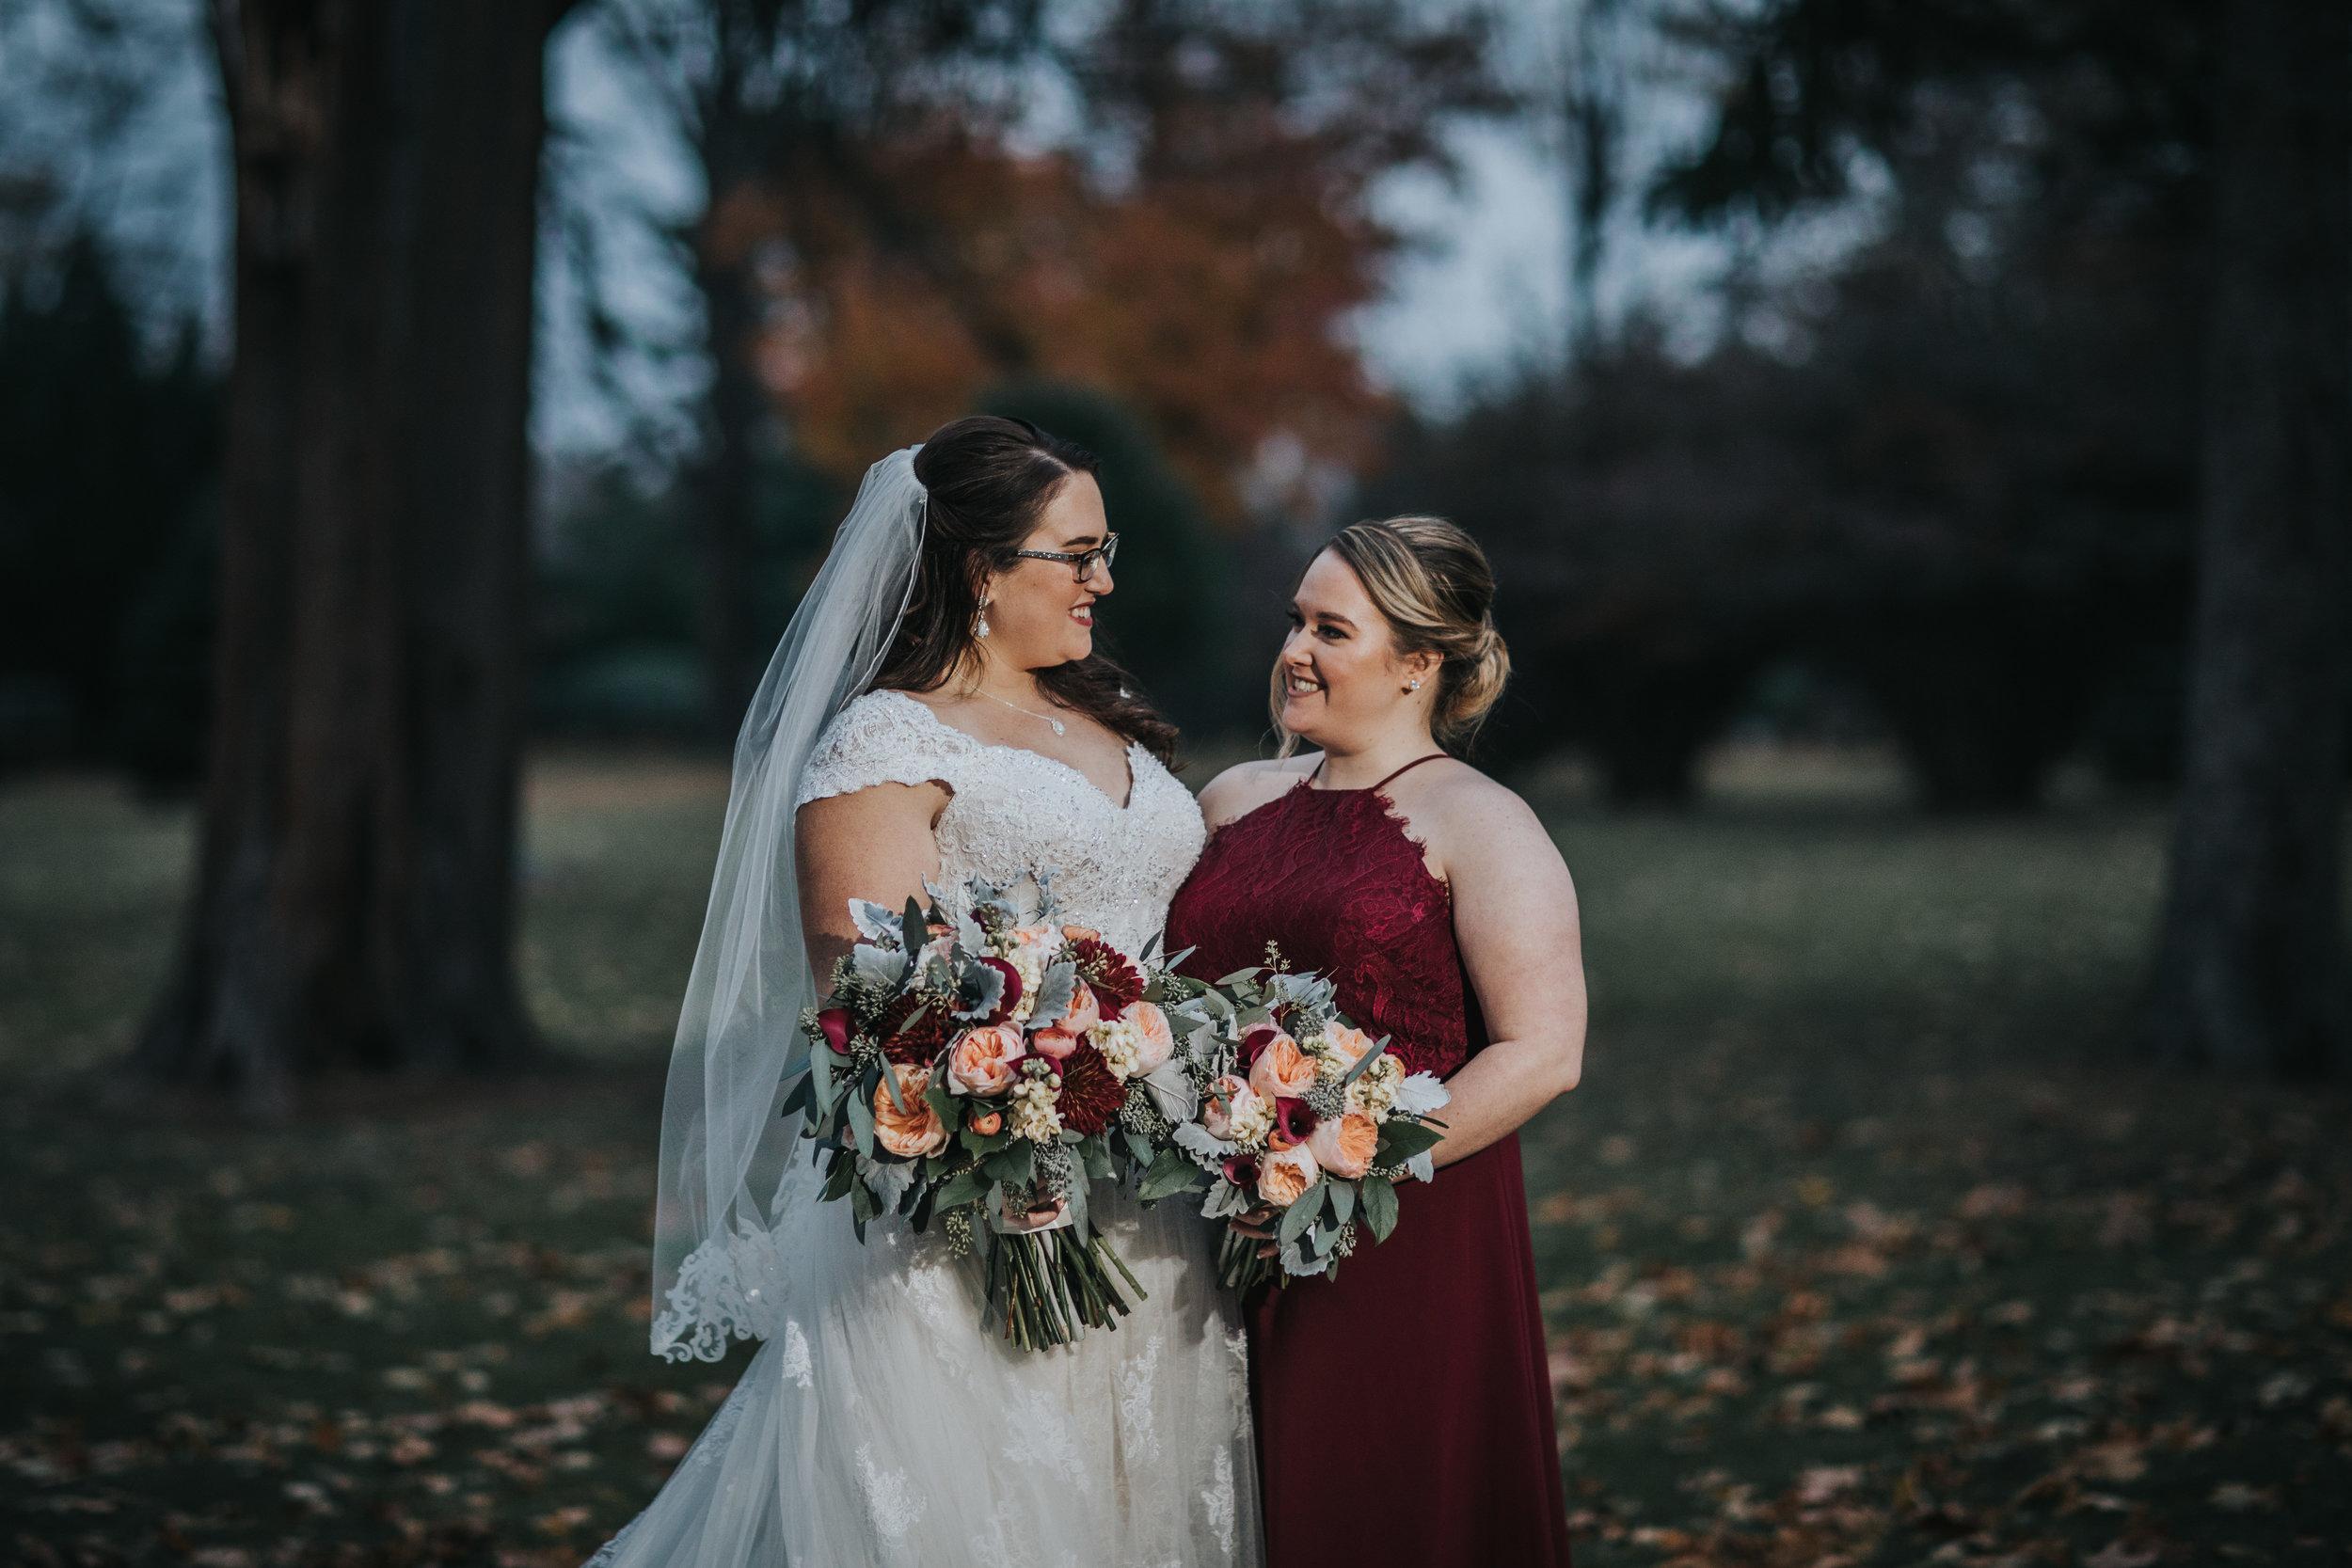 New-Jersey-Wedding-Photography-Fishers-Tudor-House-JennaLynnPhotography-BridalParty-Kathleen&Eddie-11.jpg